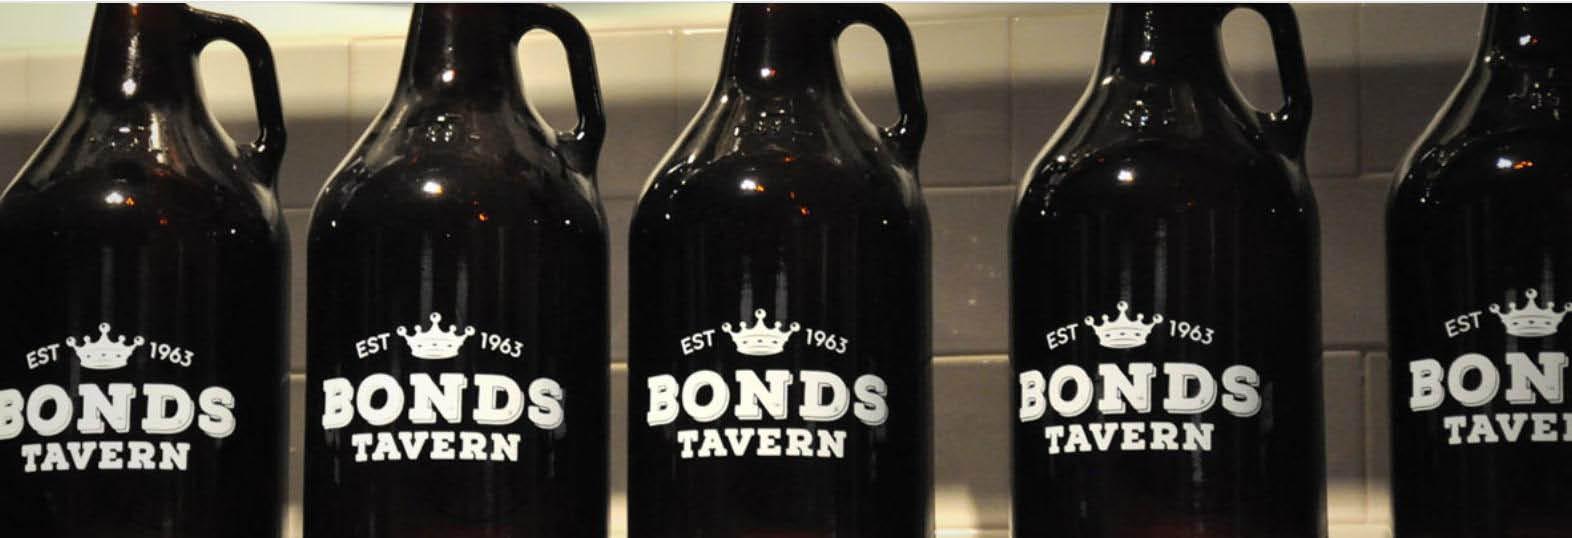 Bonds Tavern Coupons - Bonds Tavern West Orange, NJ - Bonds Tavern Coupons